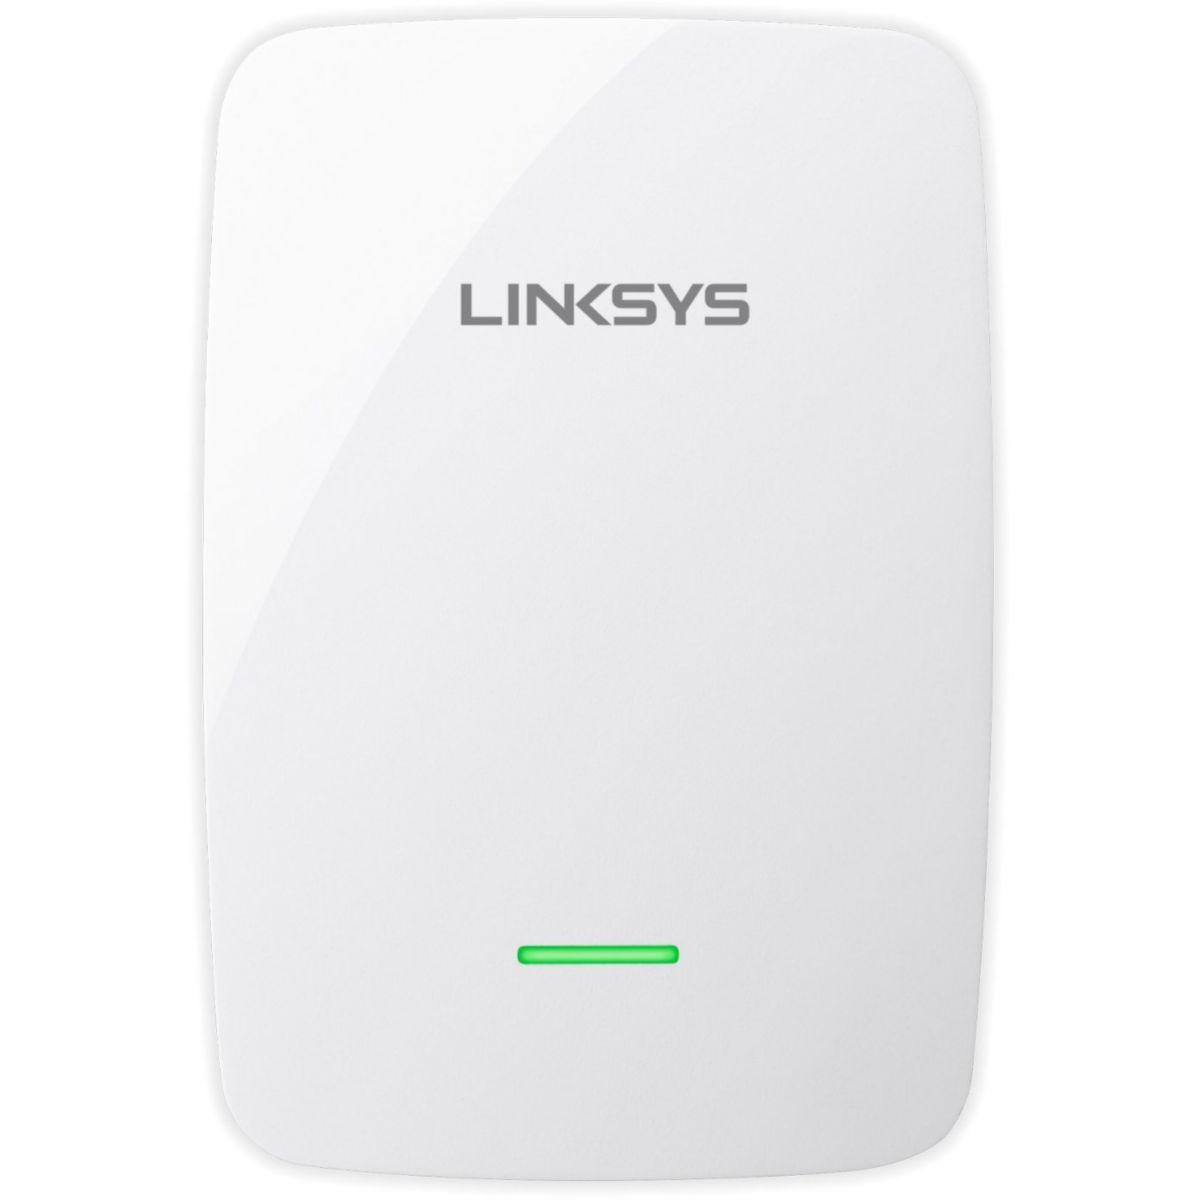 Répéteur Wifi LINKSYS N600 RE4100W